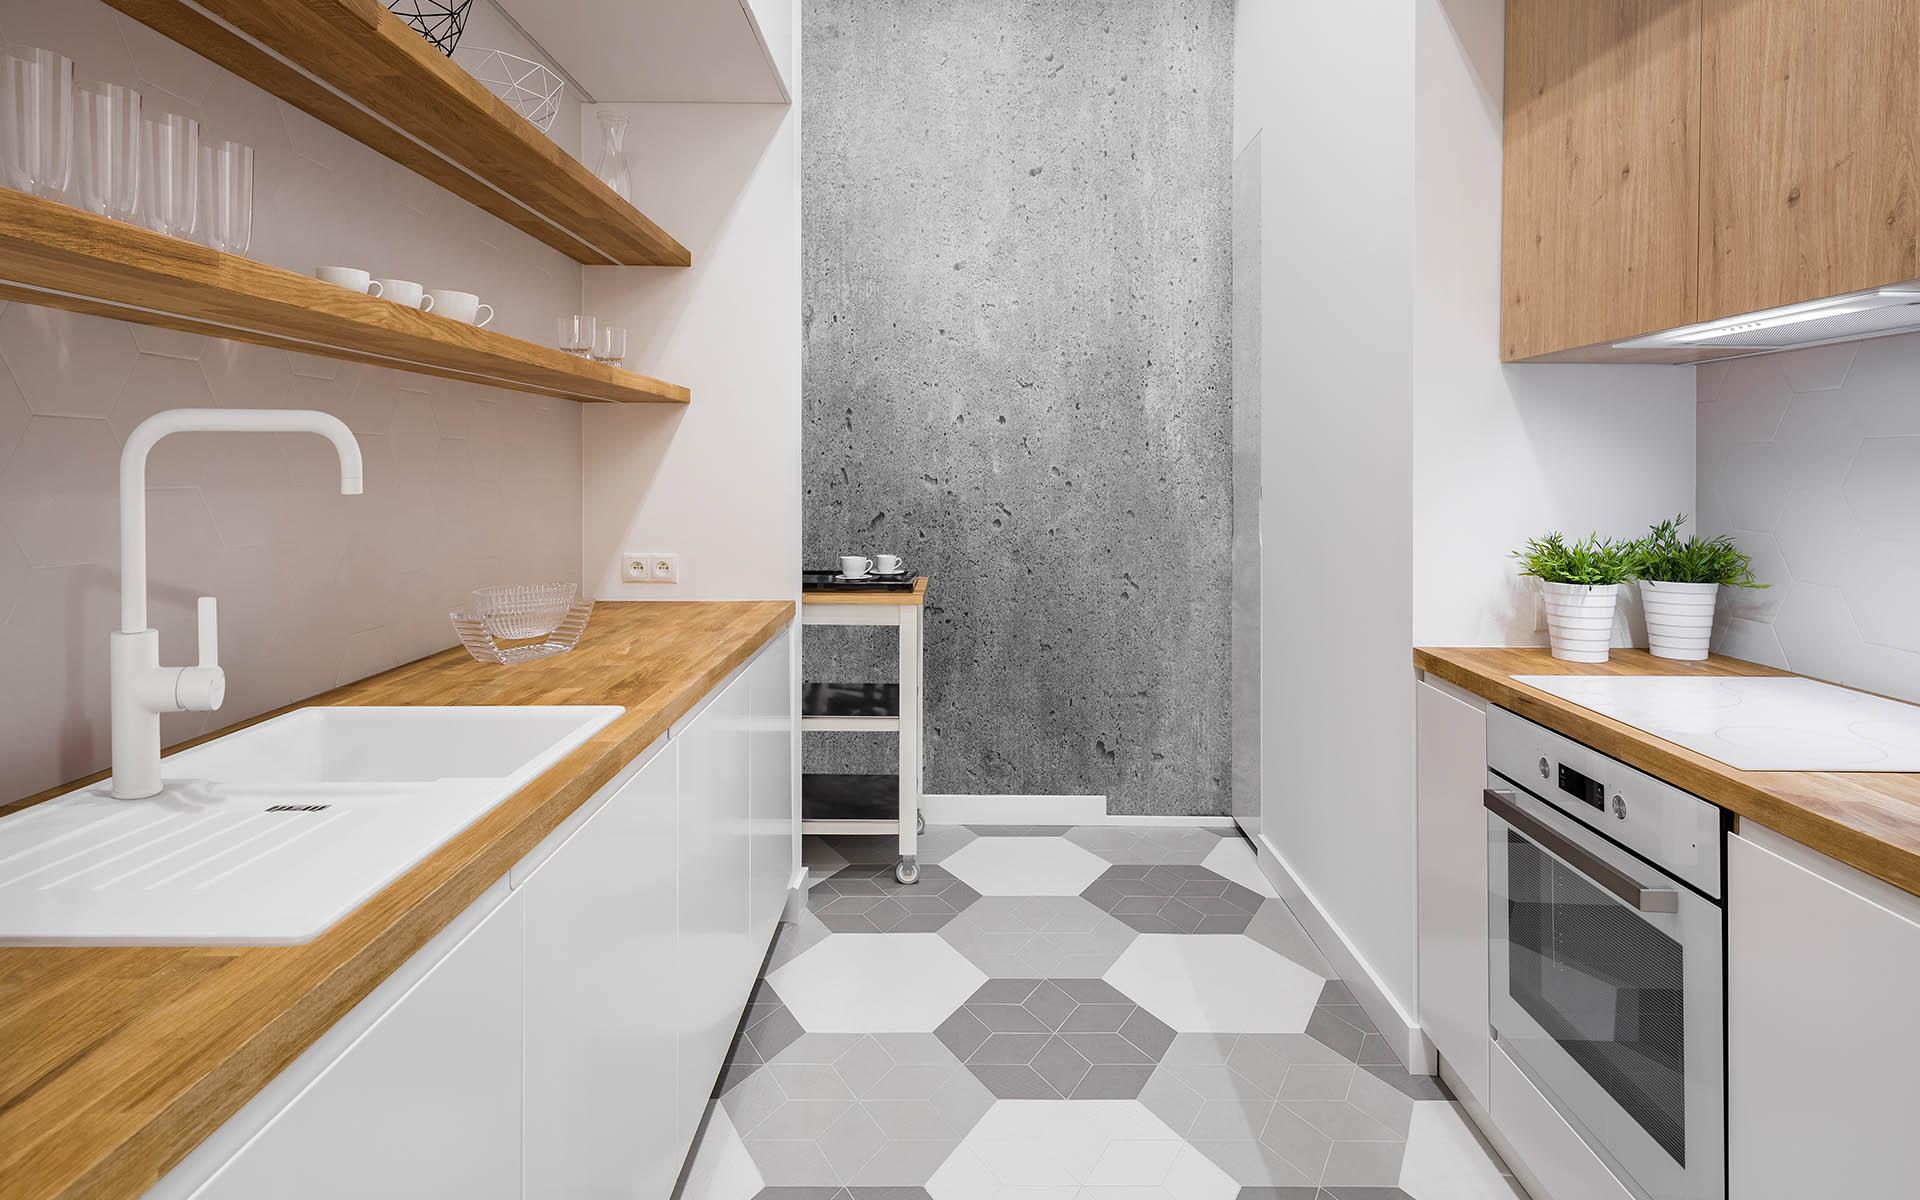 On - Trend Kitchen Mixers